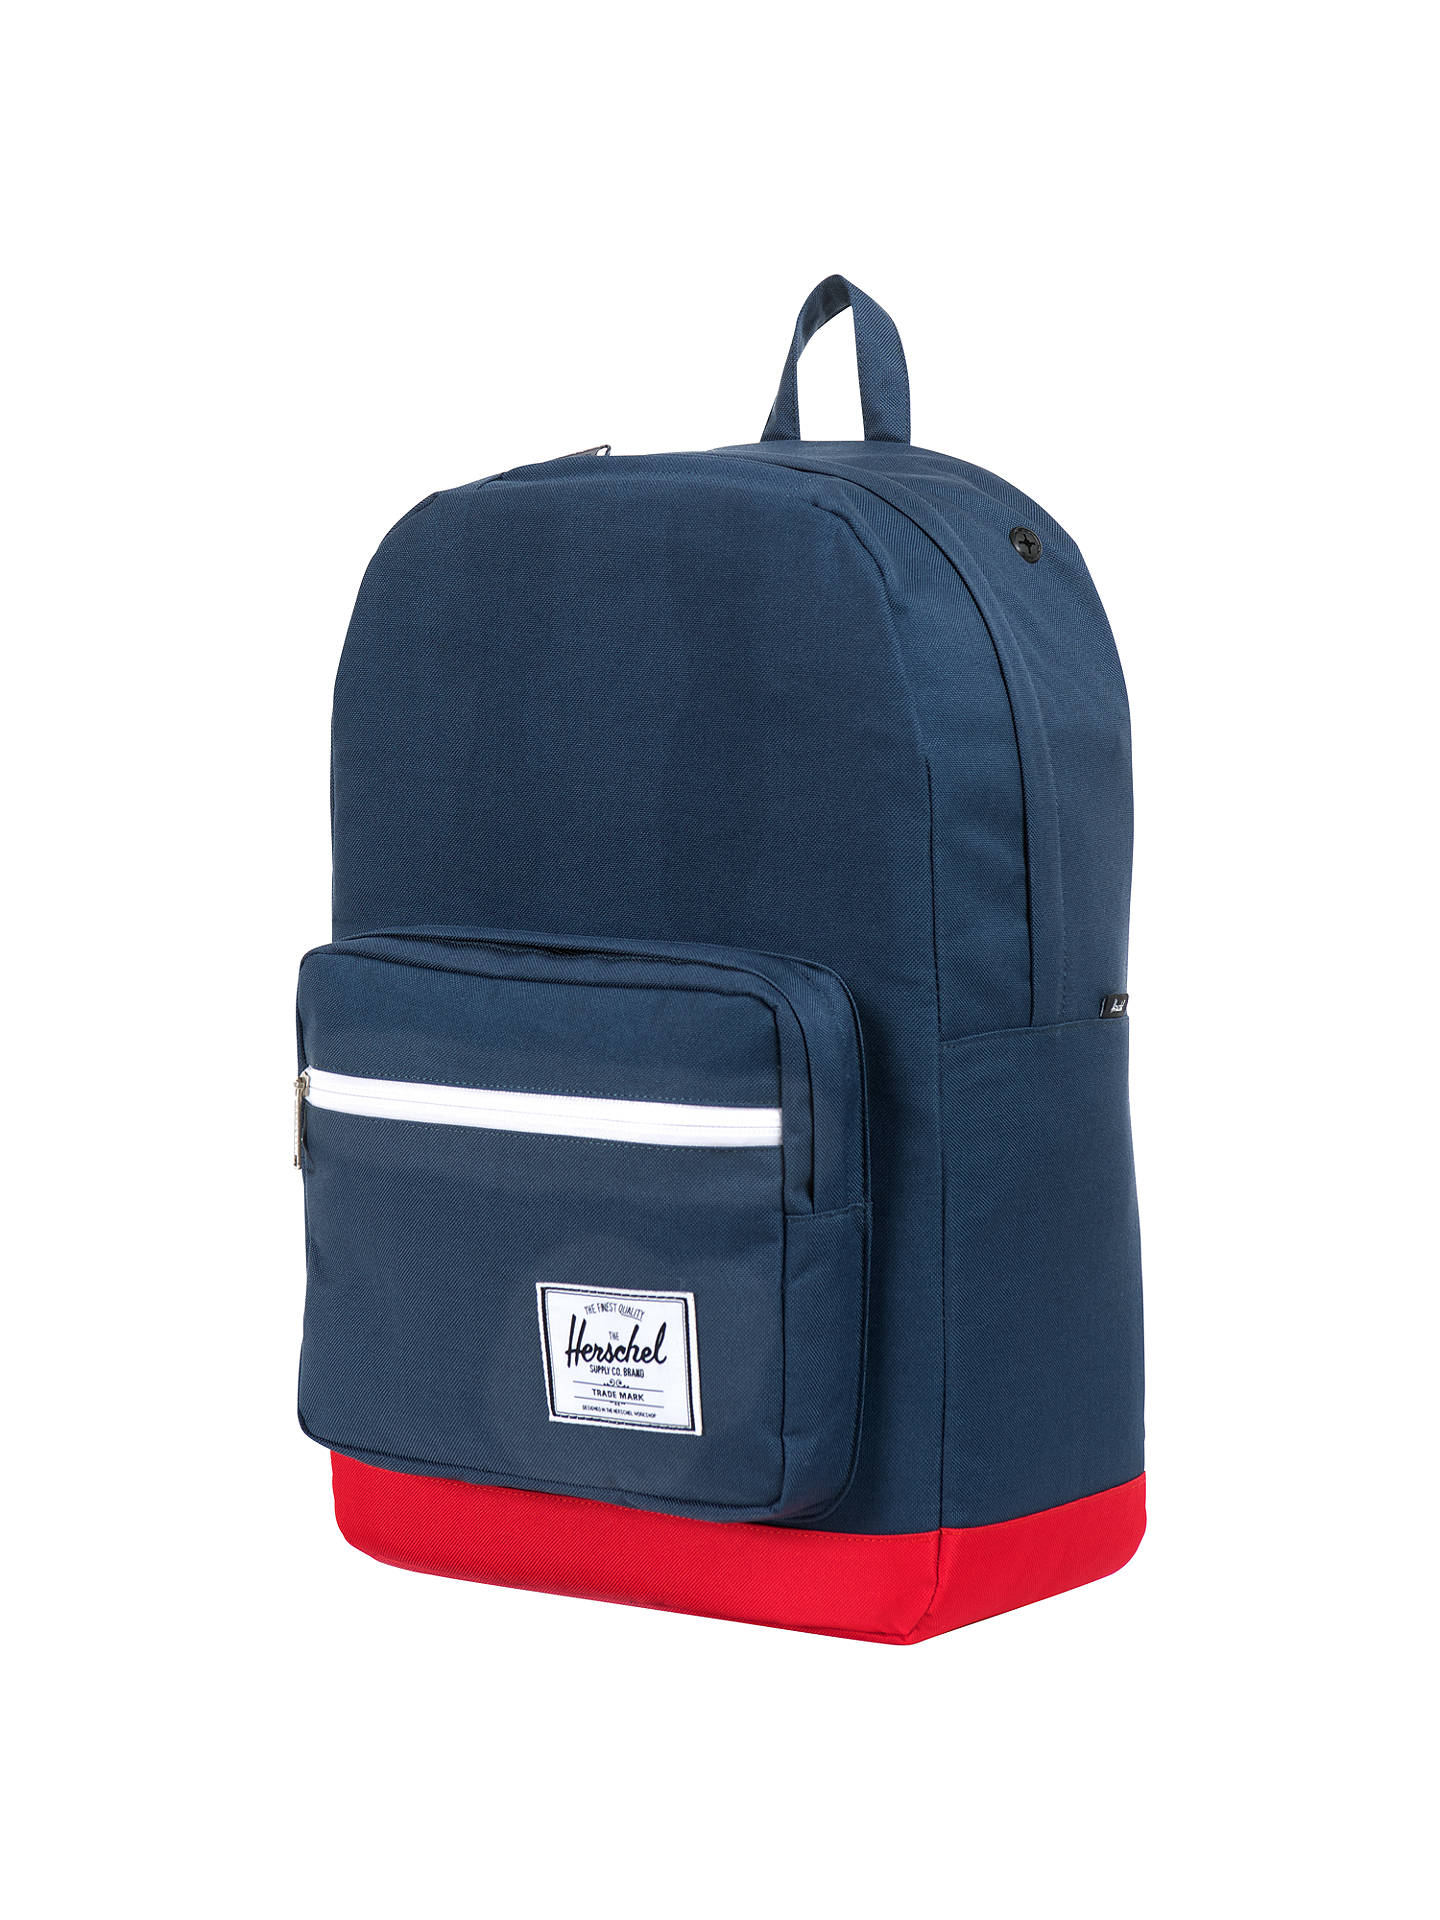 142f46ad4d0 Herschel Pop Quiz Backpack, Navy/Red at John Lewis & Partners